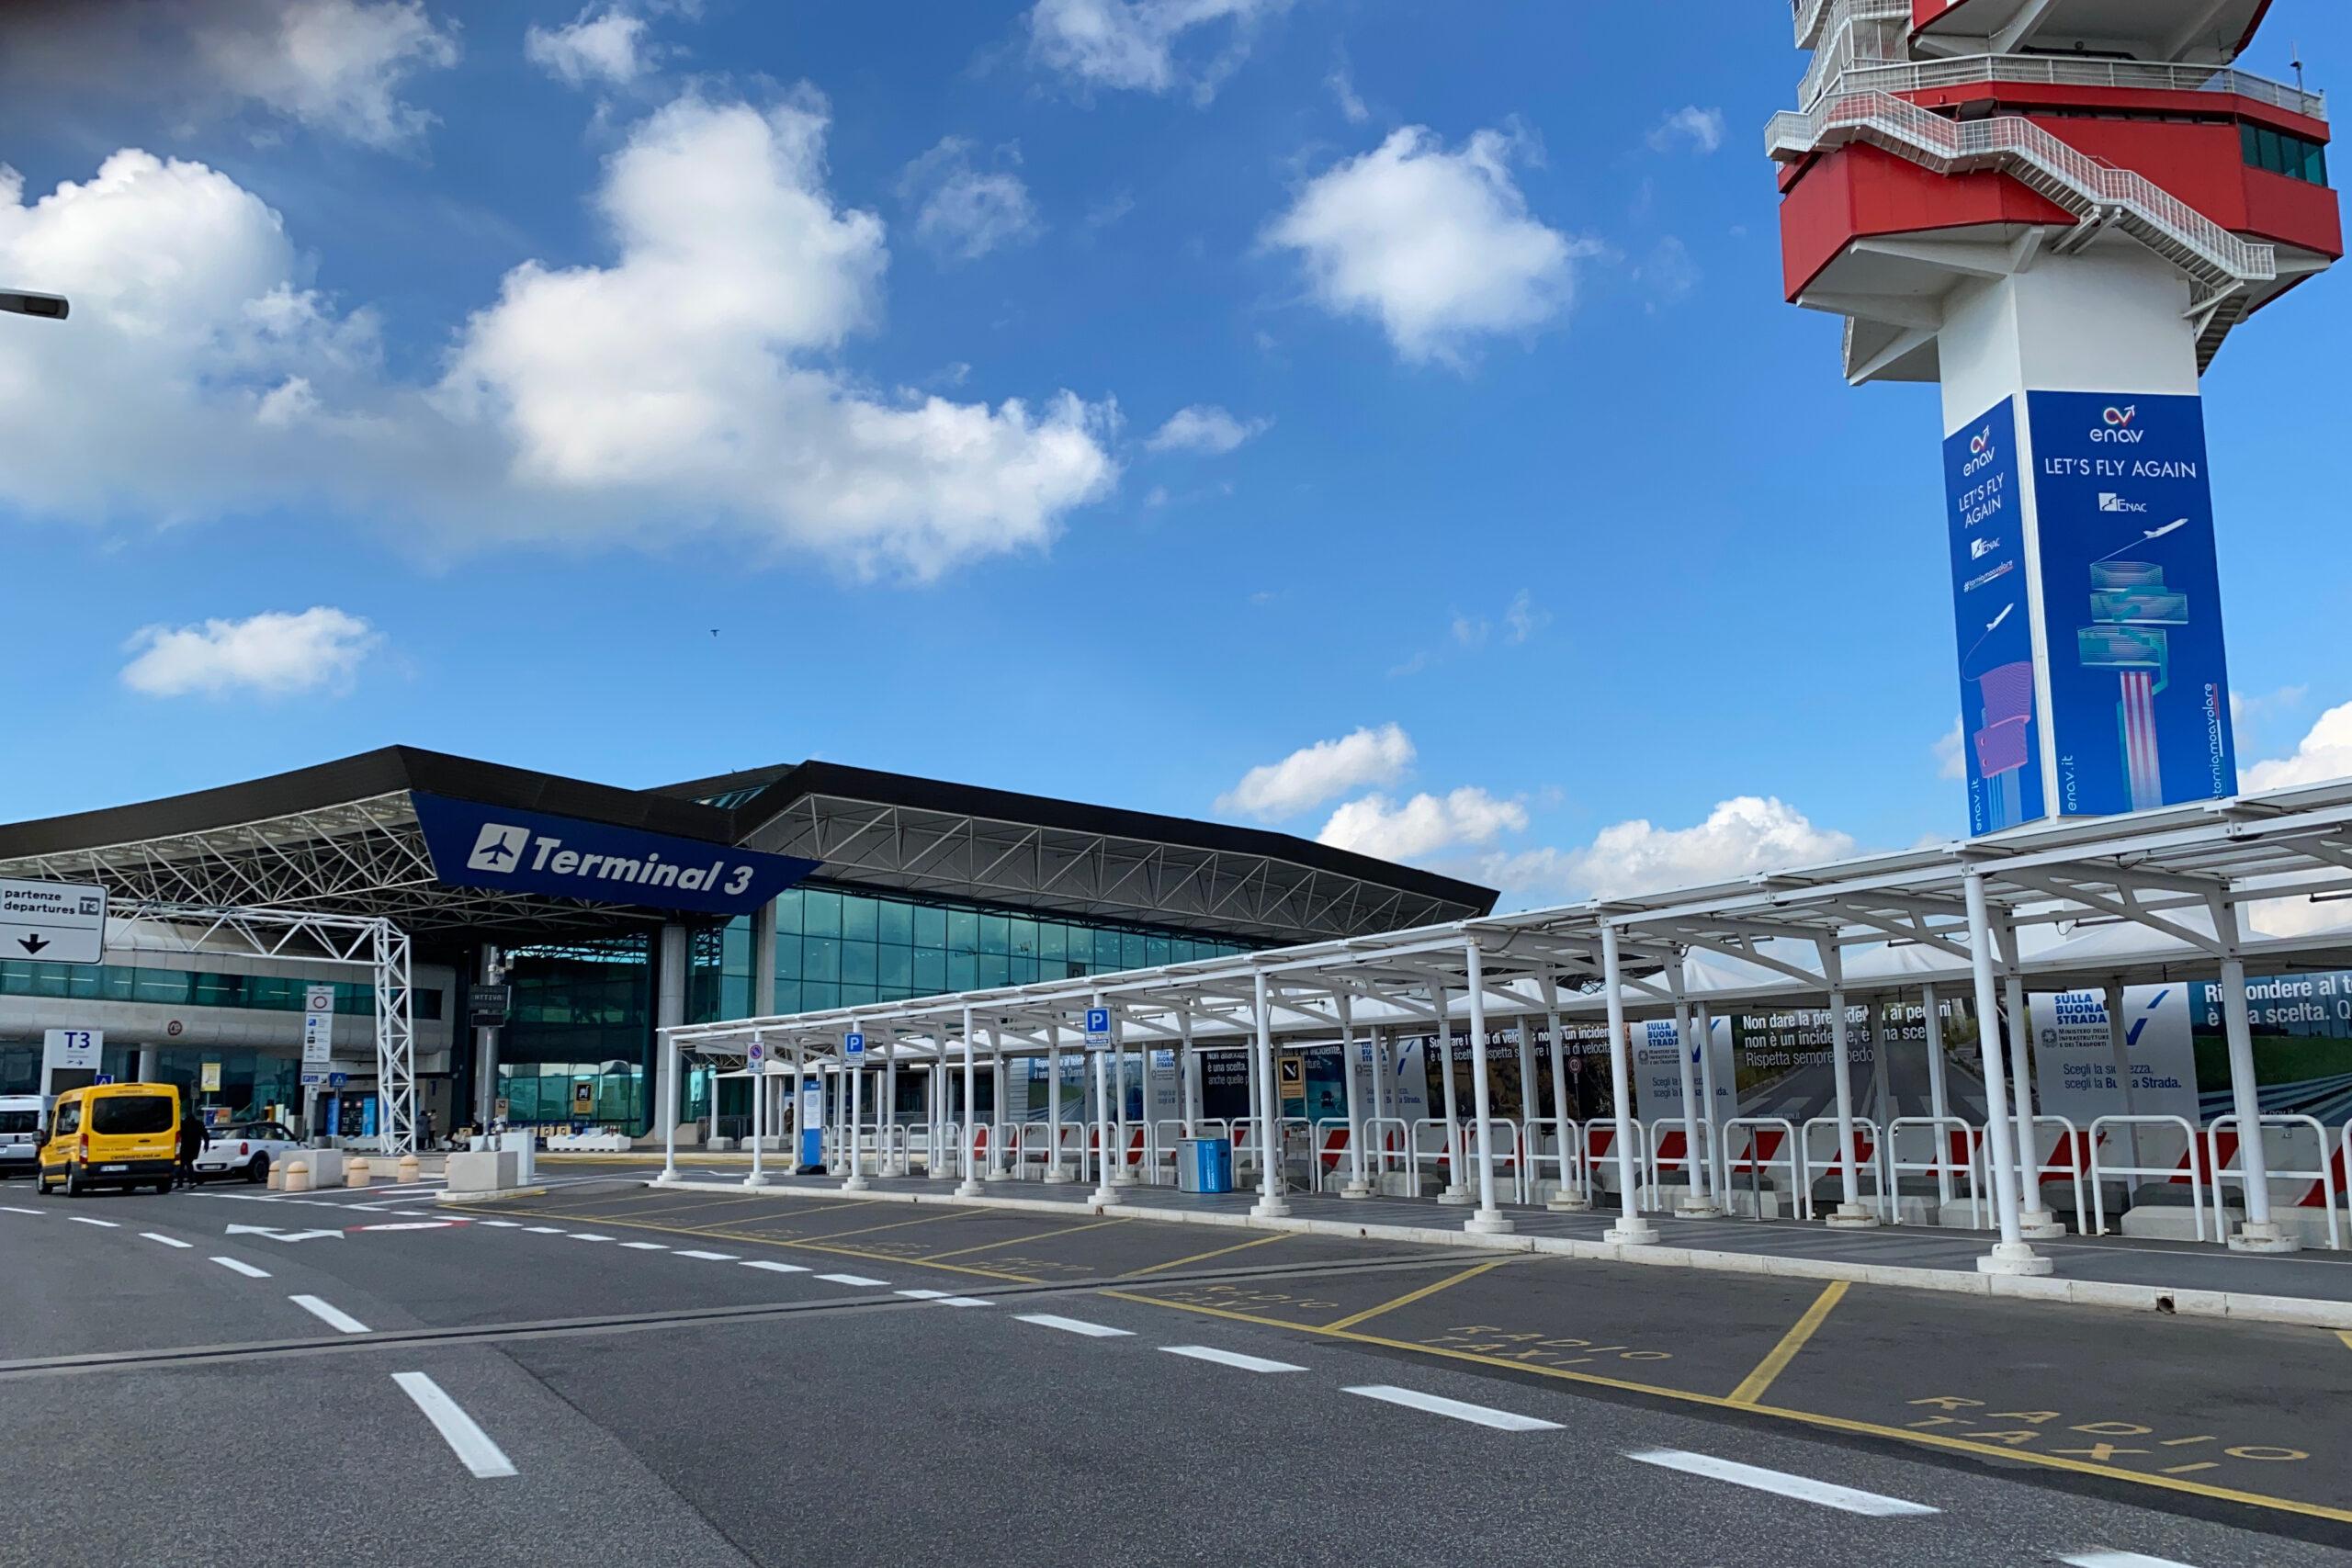 Terminal 3 Cile